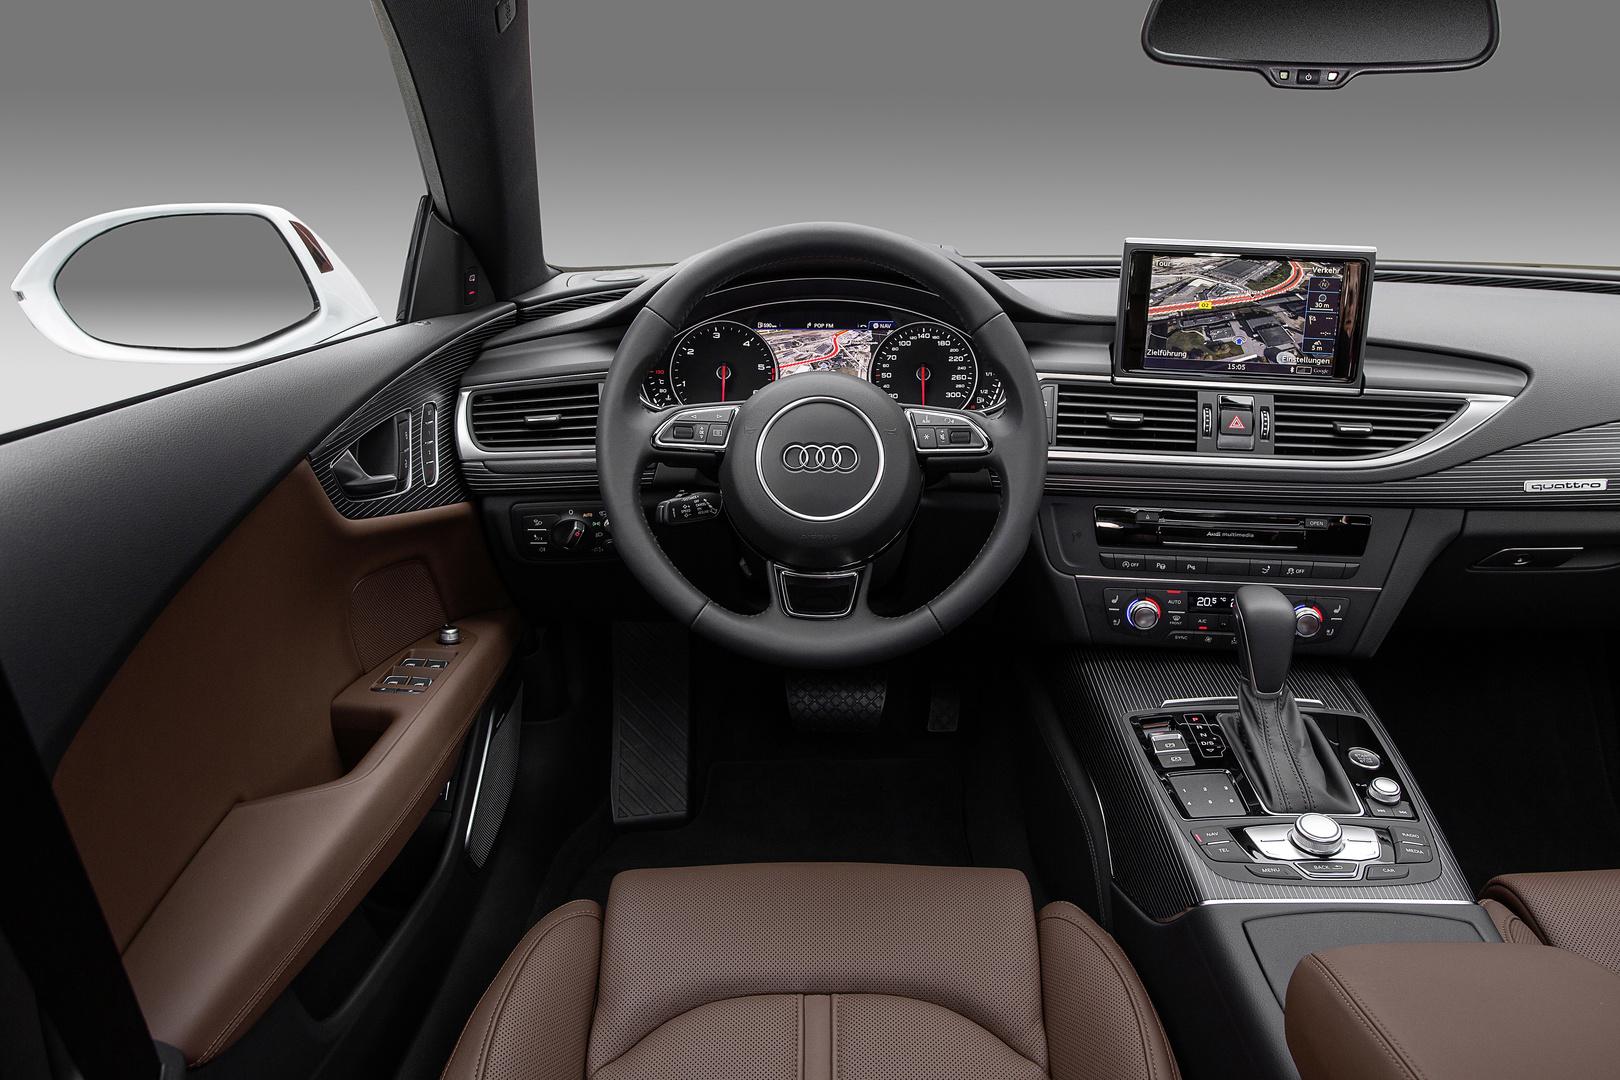 Audi A7 Sportback – Cockpit